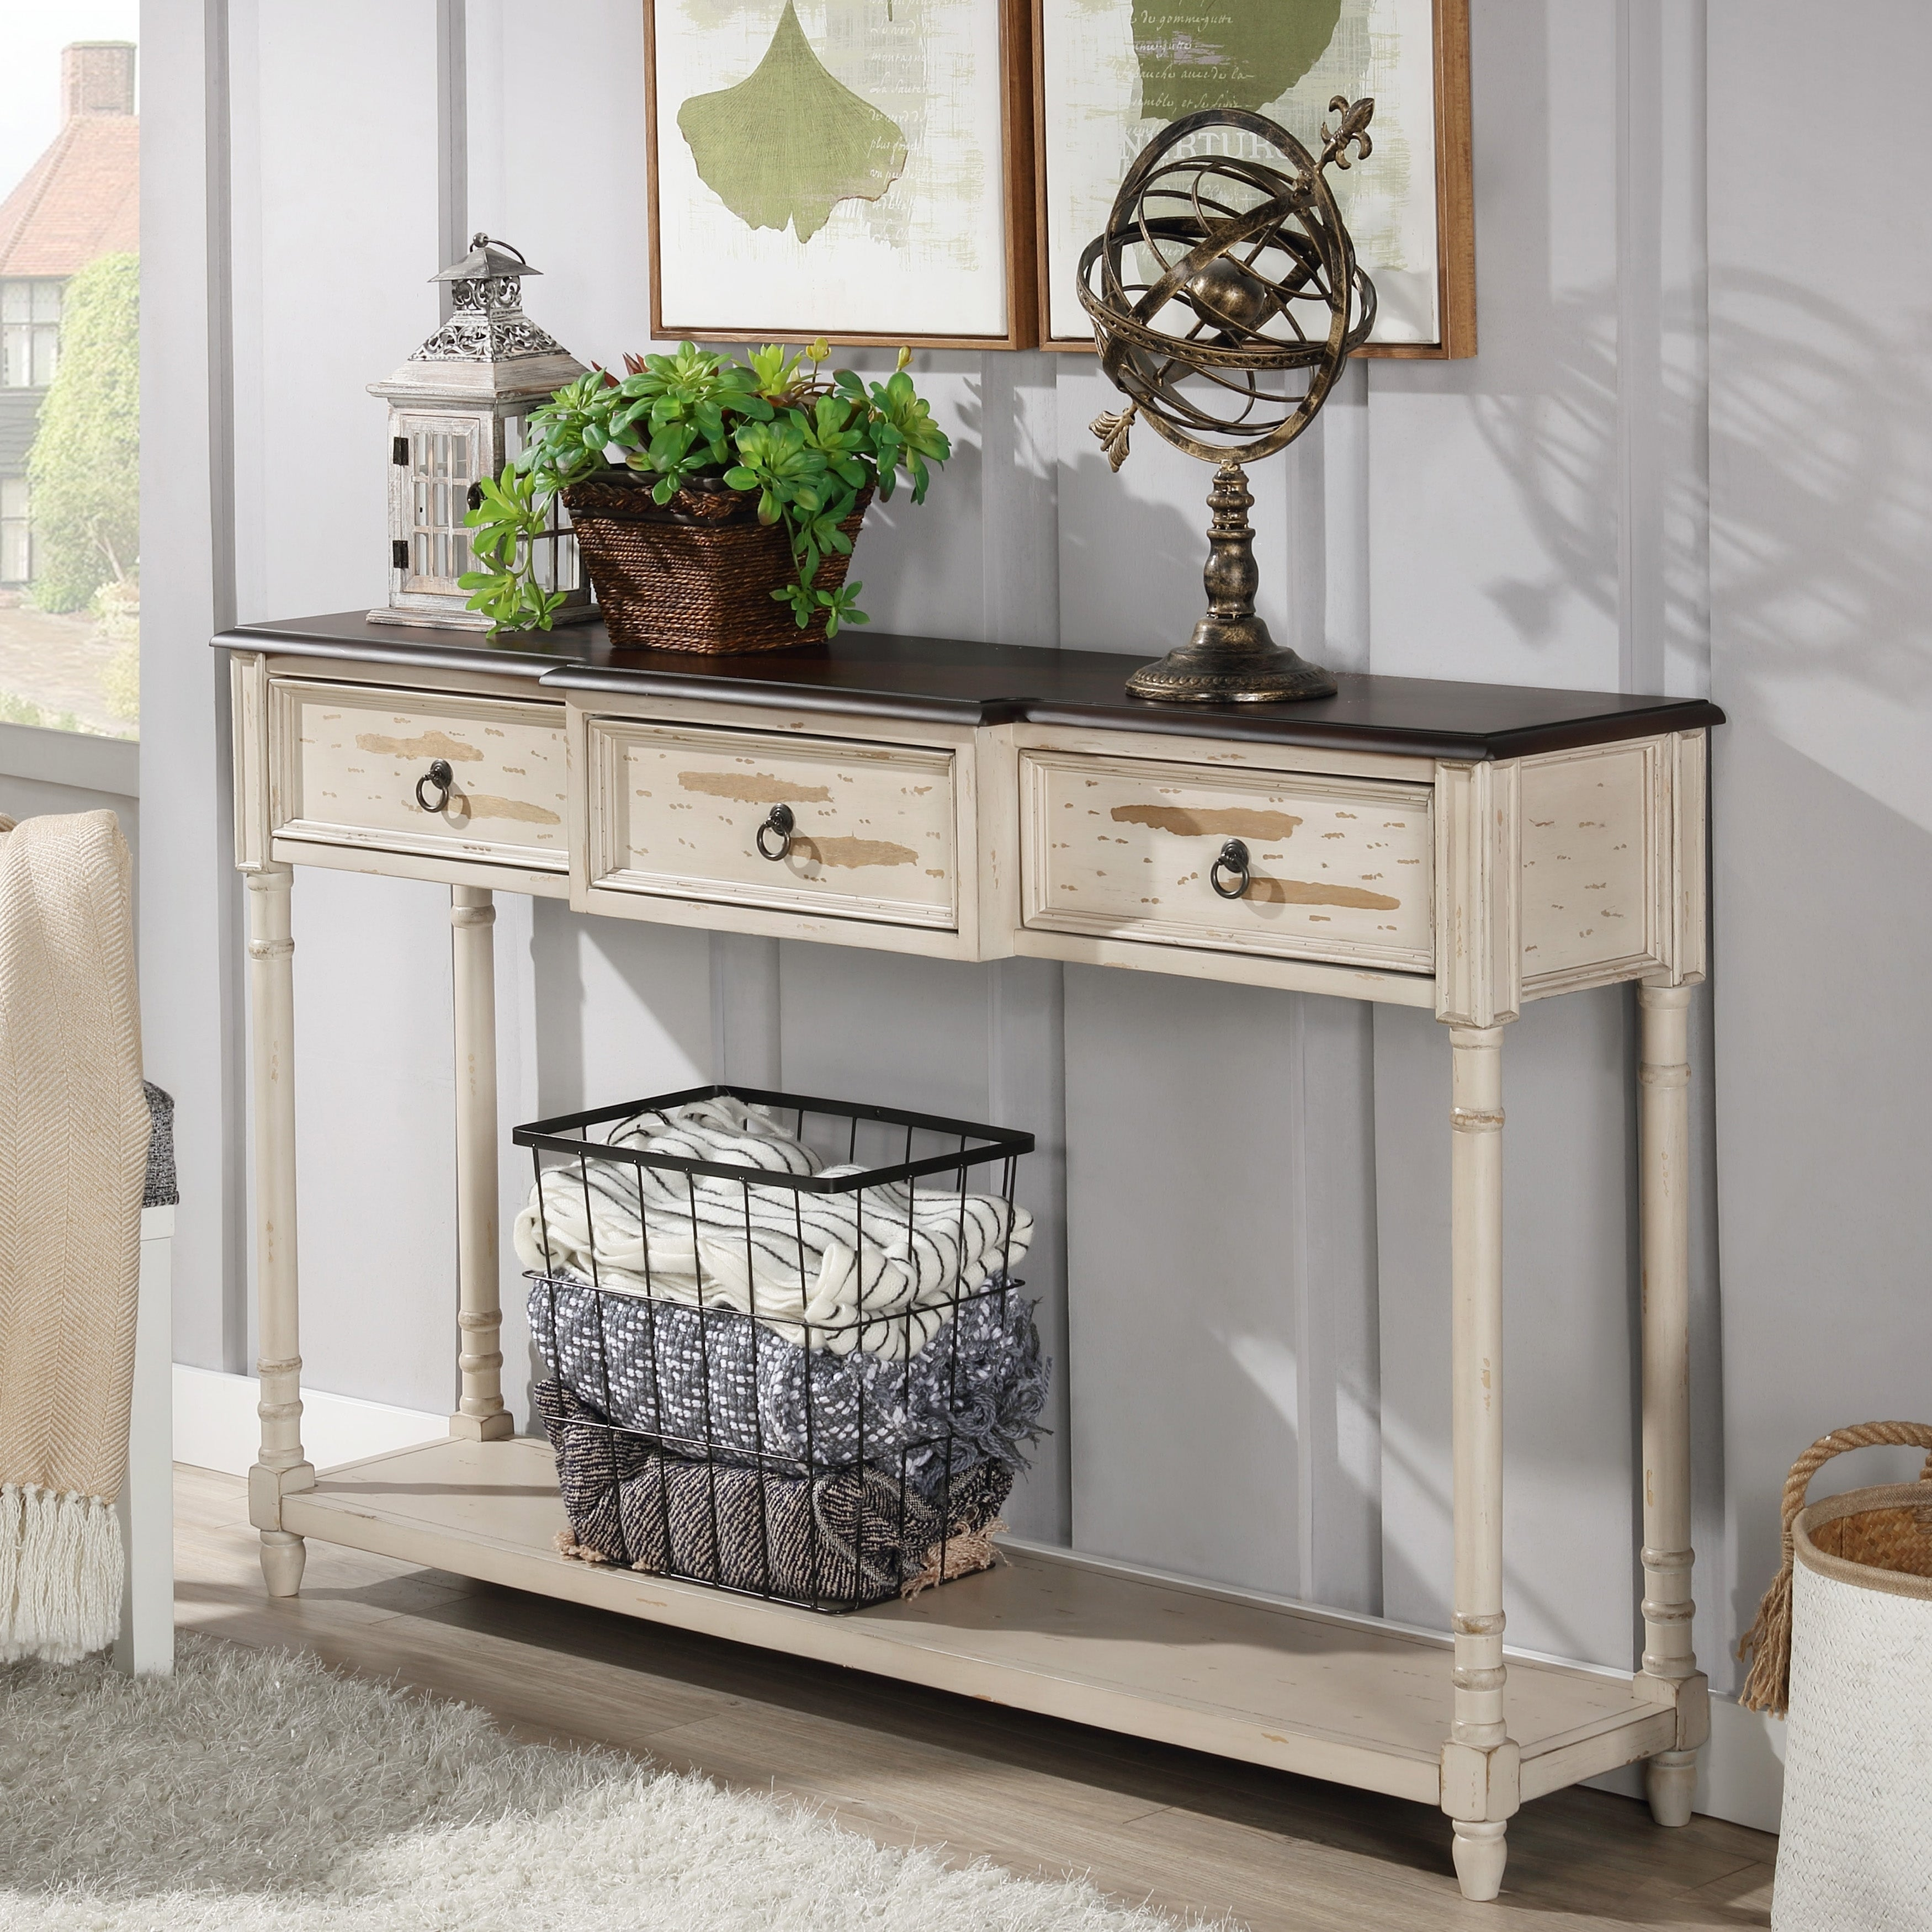 The Gray Barn Hogback Farmhouse Antique White Console Table